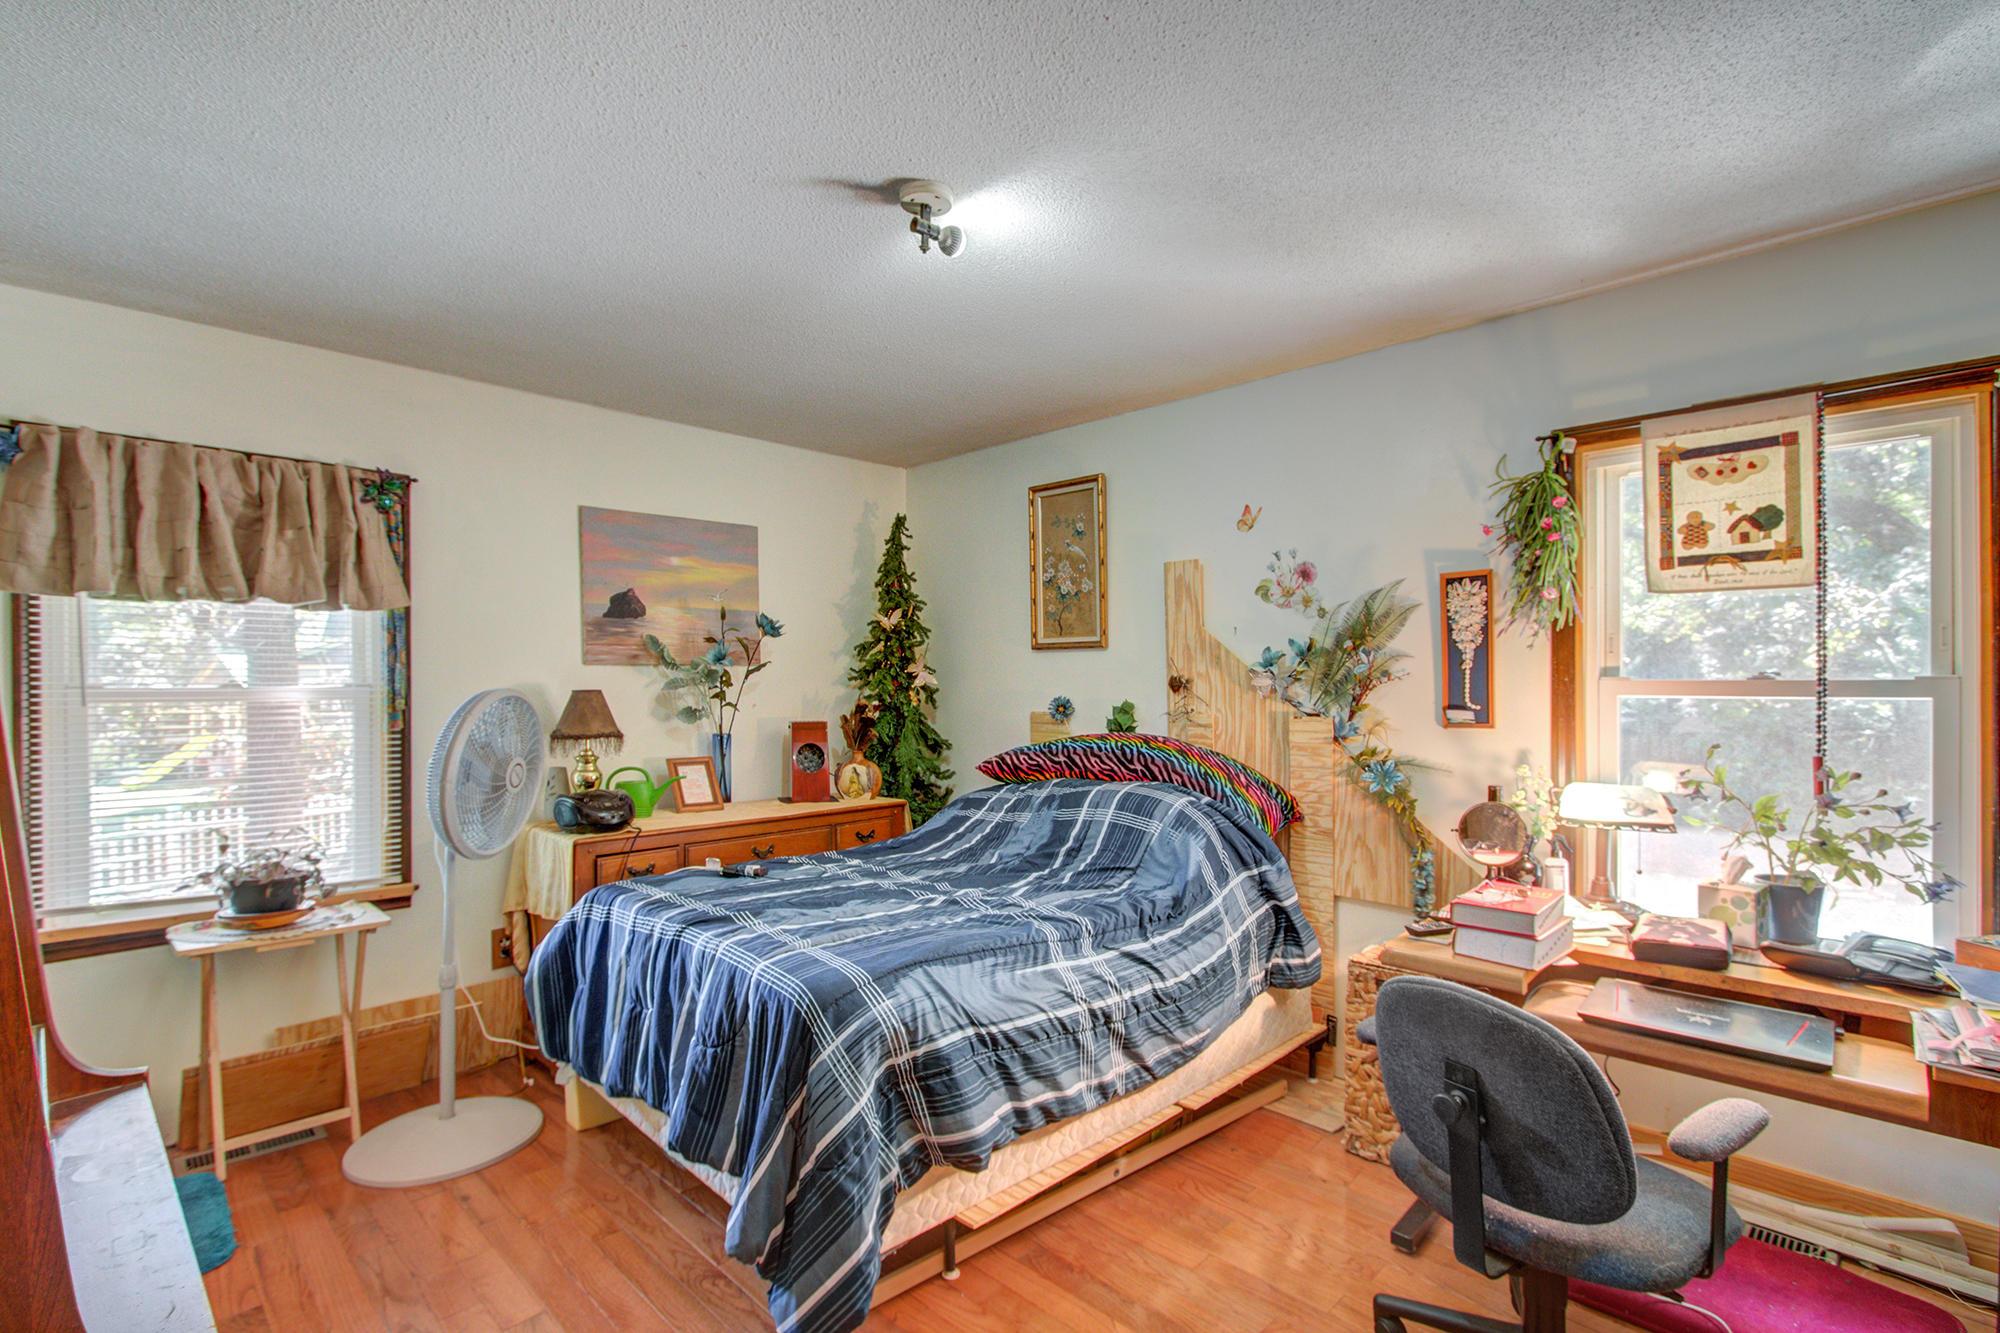 Wando Lakes Homes For Sale - 858 Fairlawn, Mount Pleasant, SC - 19